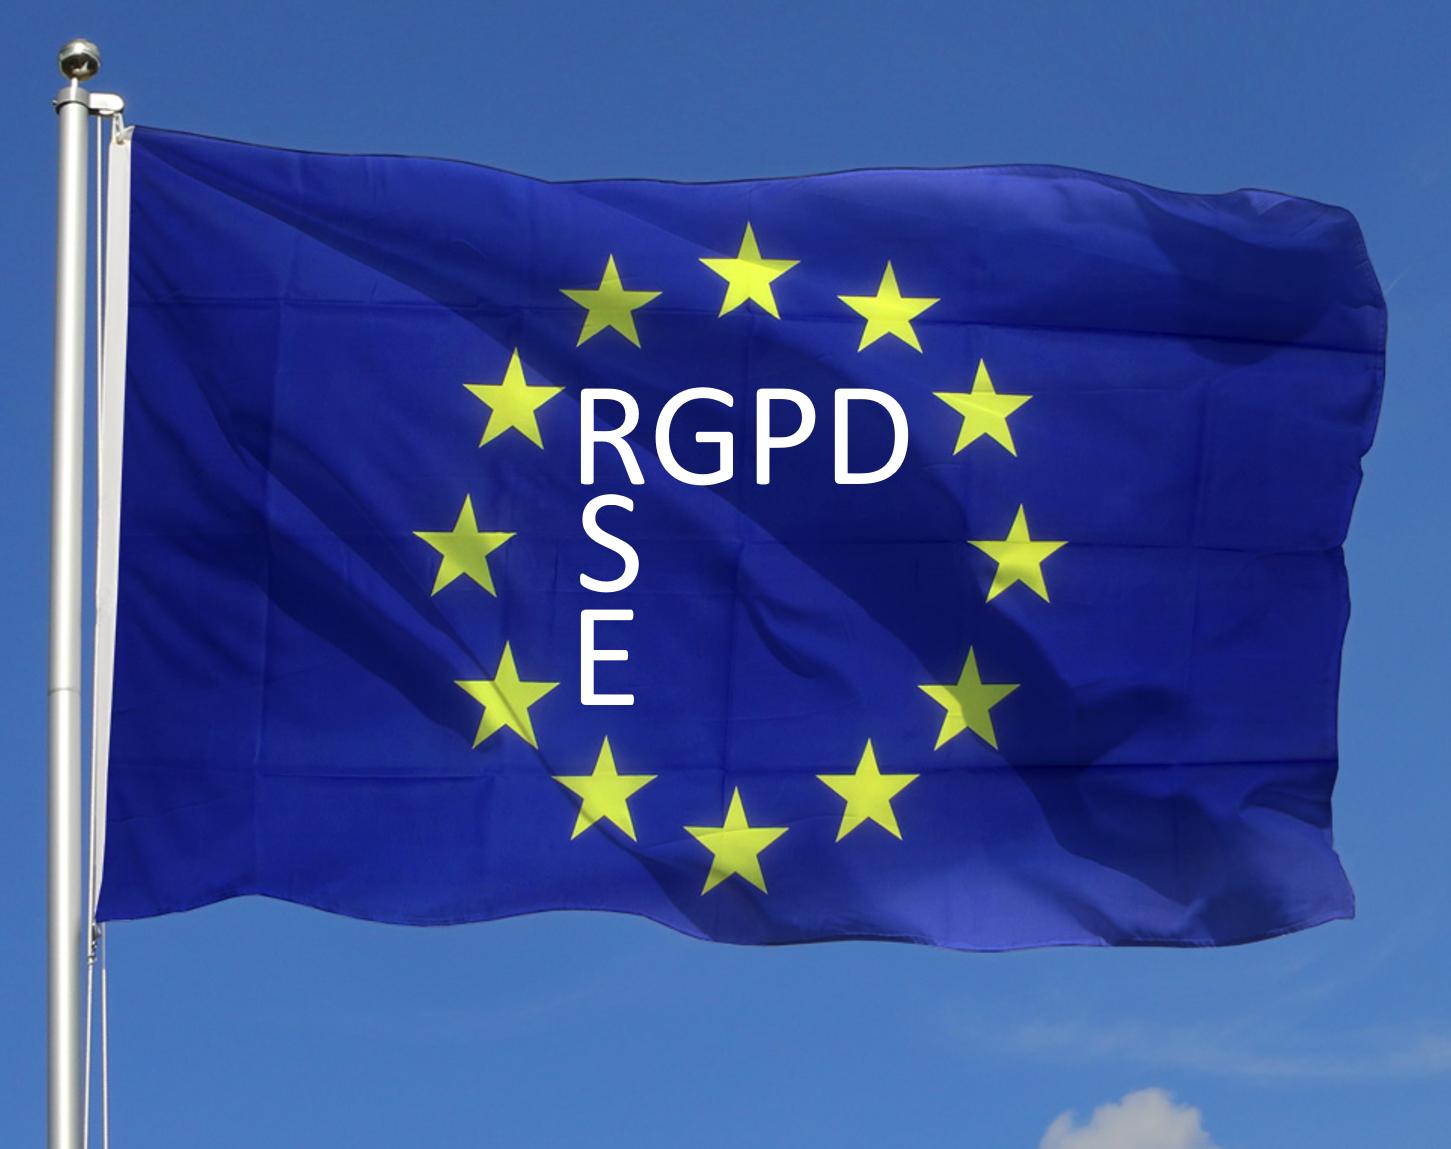 RGPD RSE